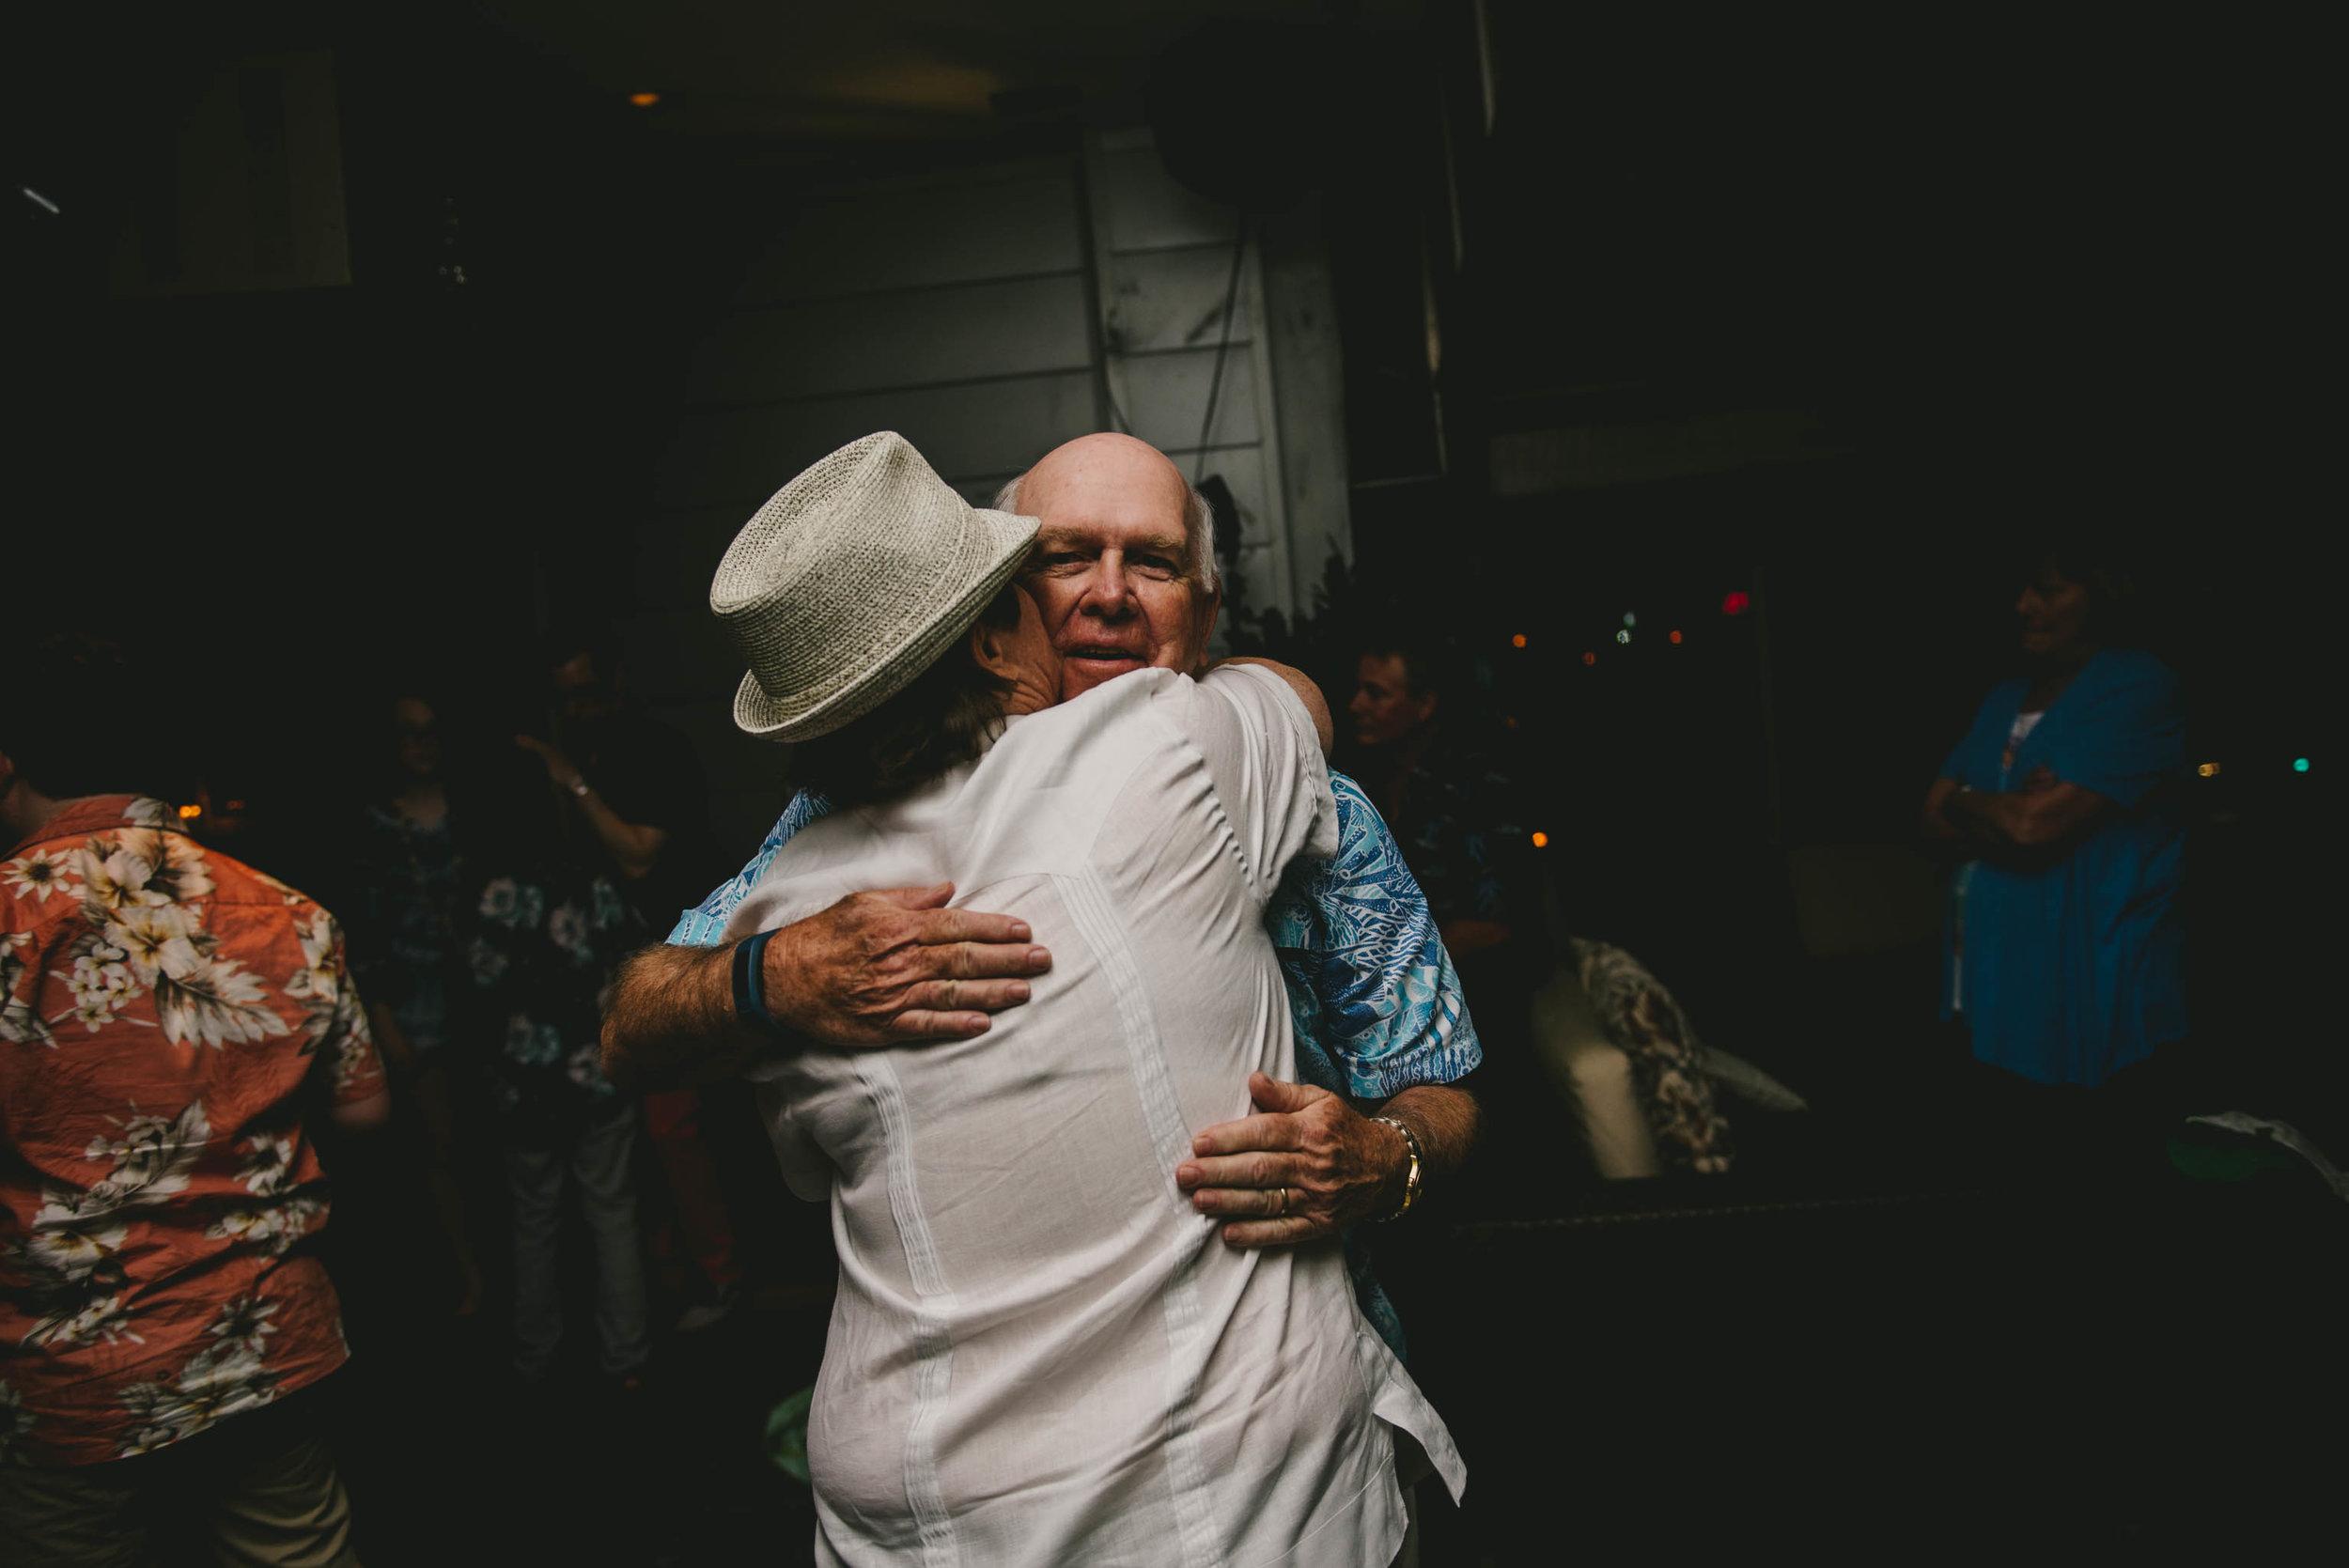 solas-restaurant-raleigh-same-sex-wedding-bride-hugging-dad-photo.jpg